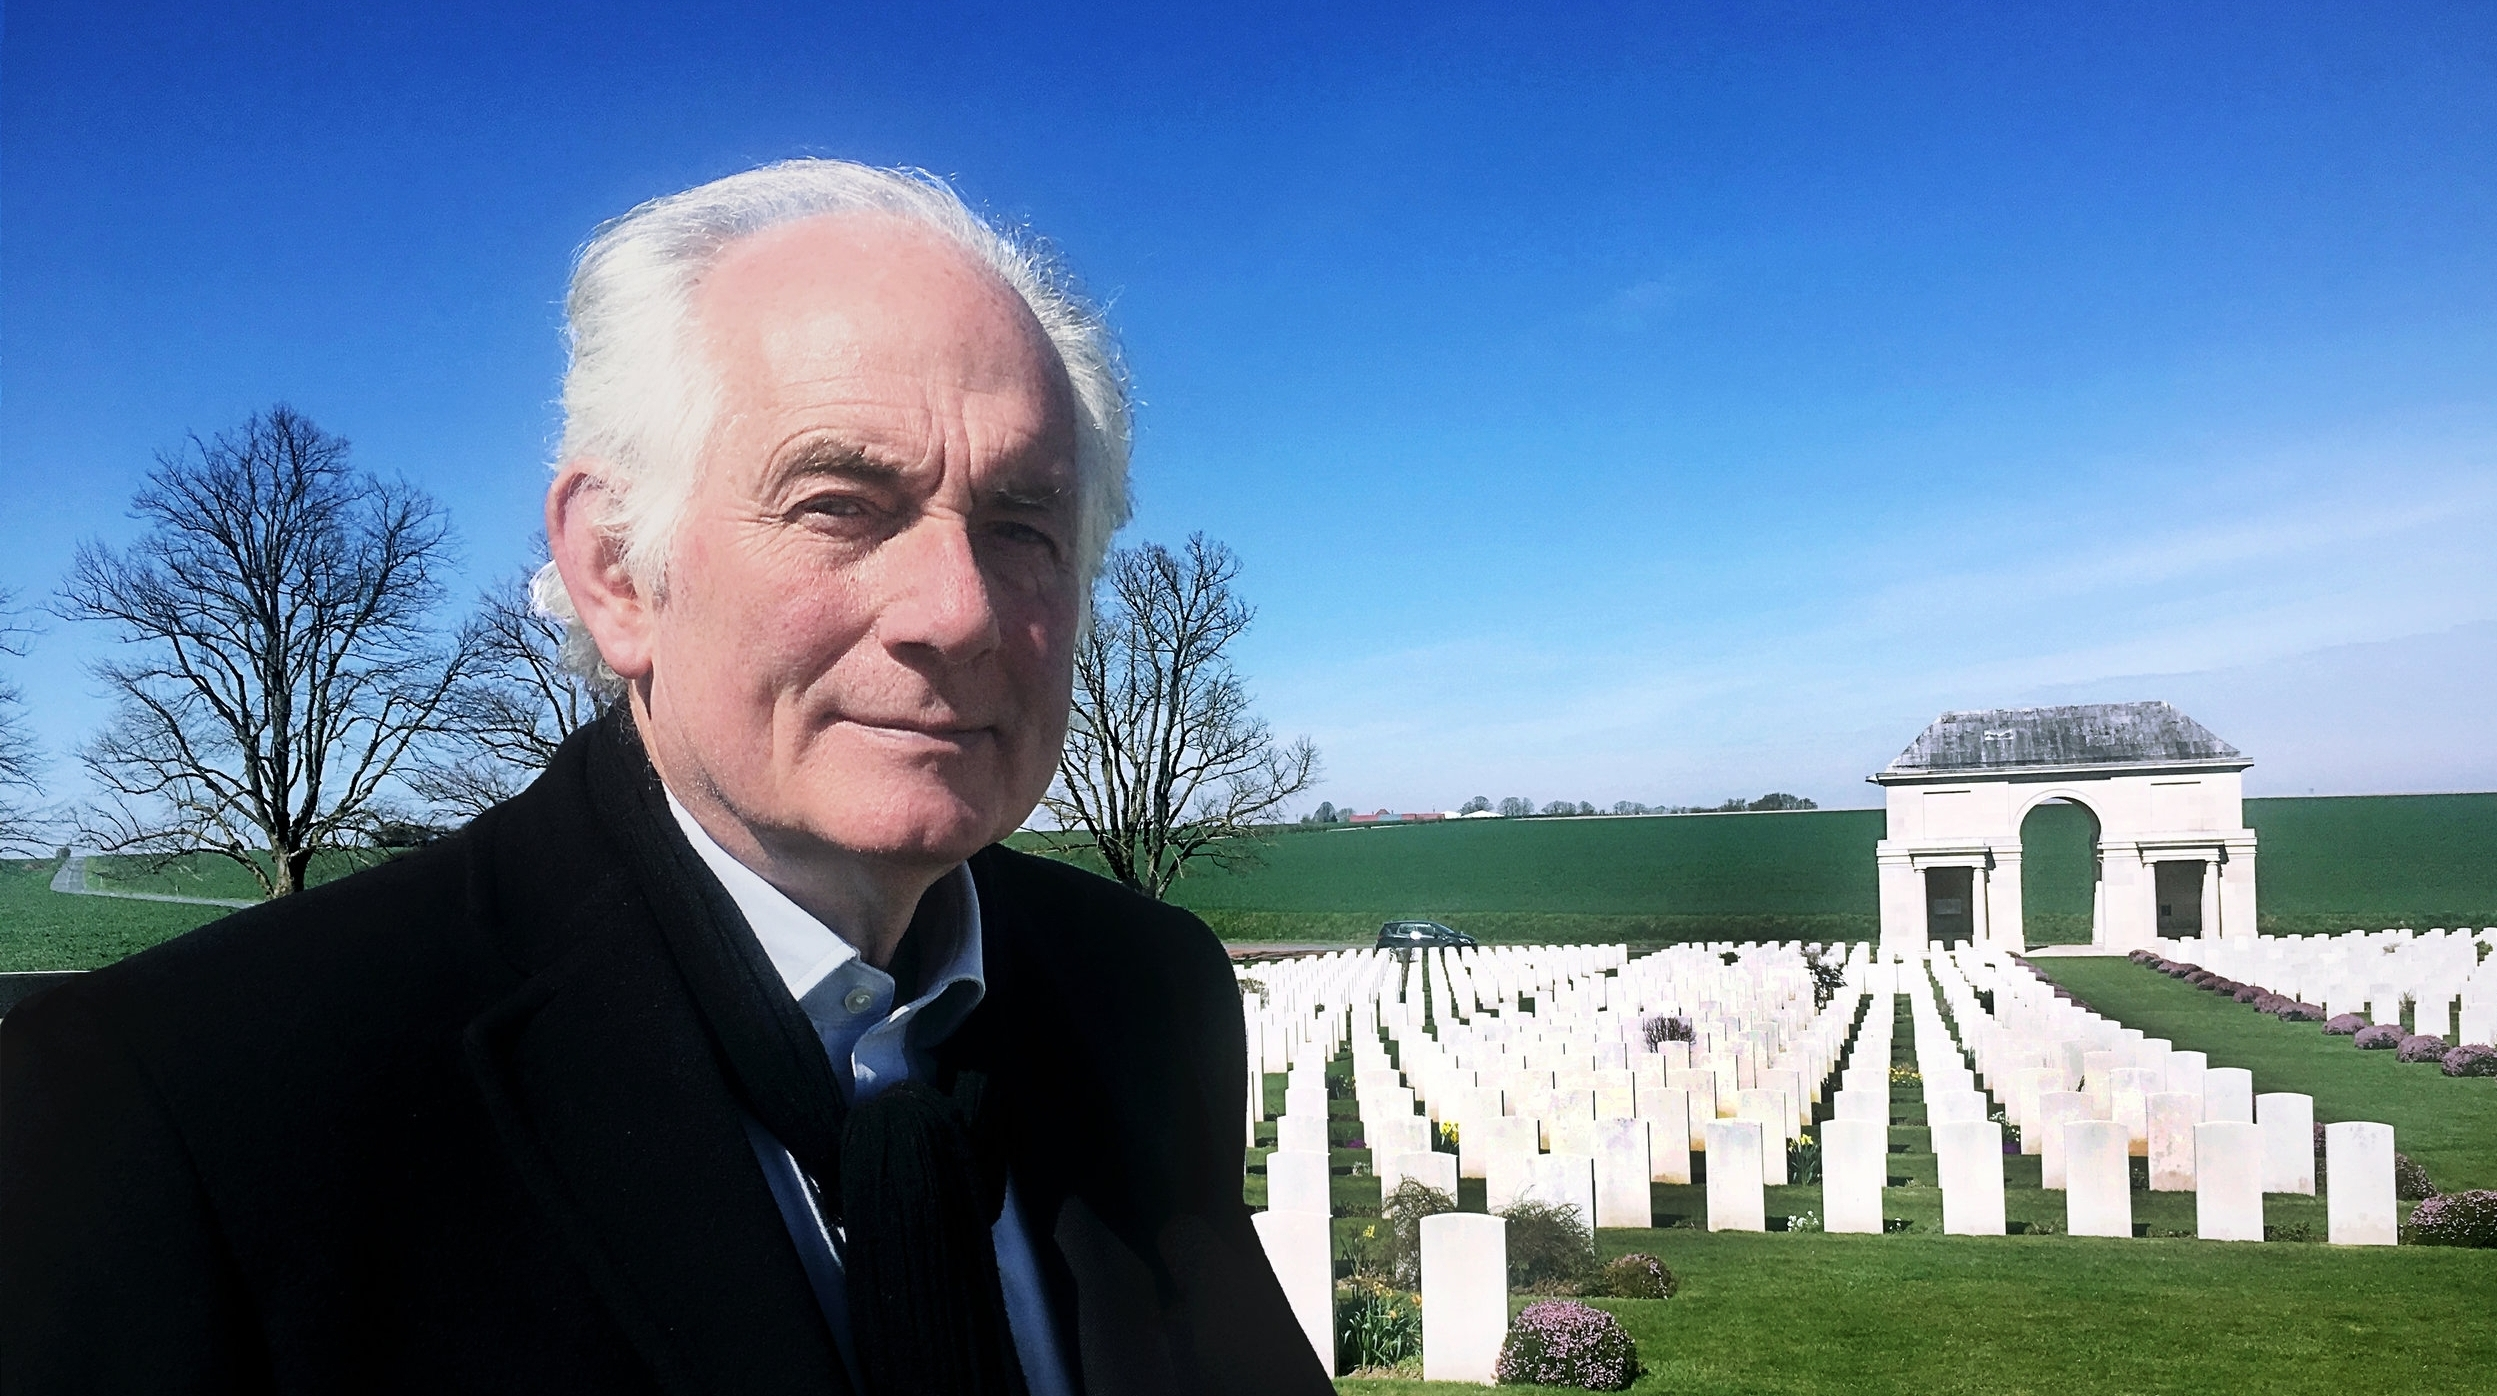 Dan Cruickshank's Monuments of Remembrance - BBC NI / BBC FOUR